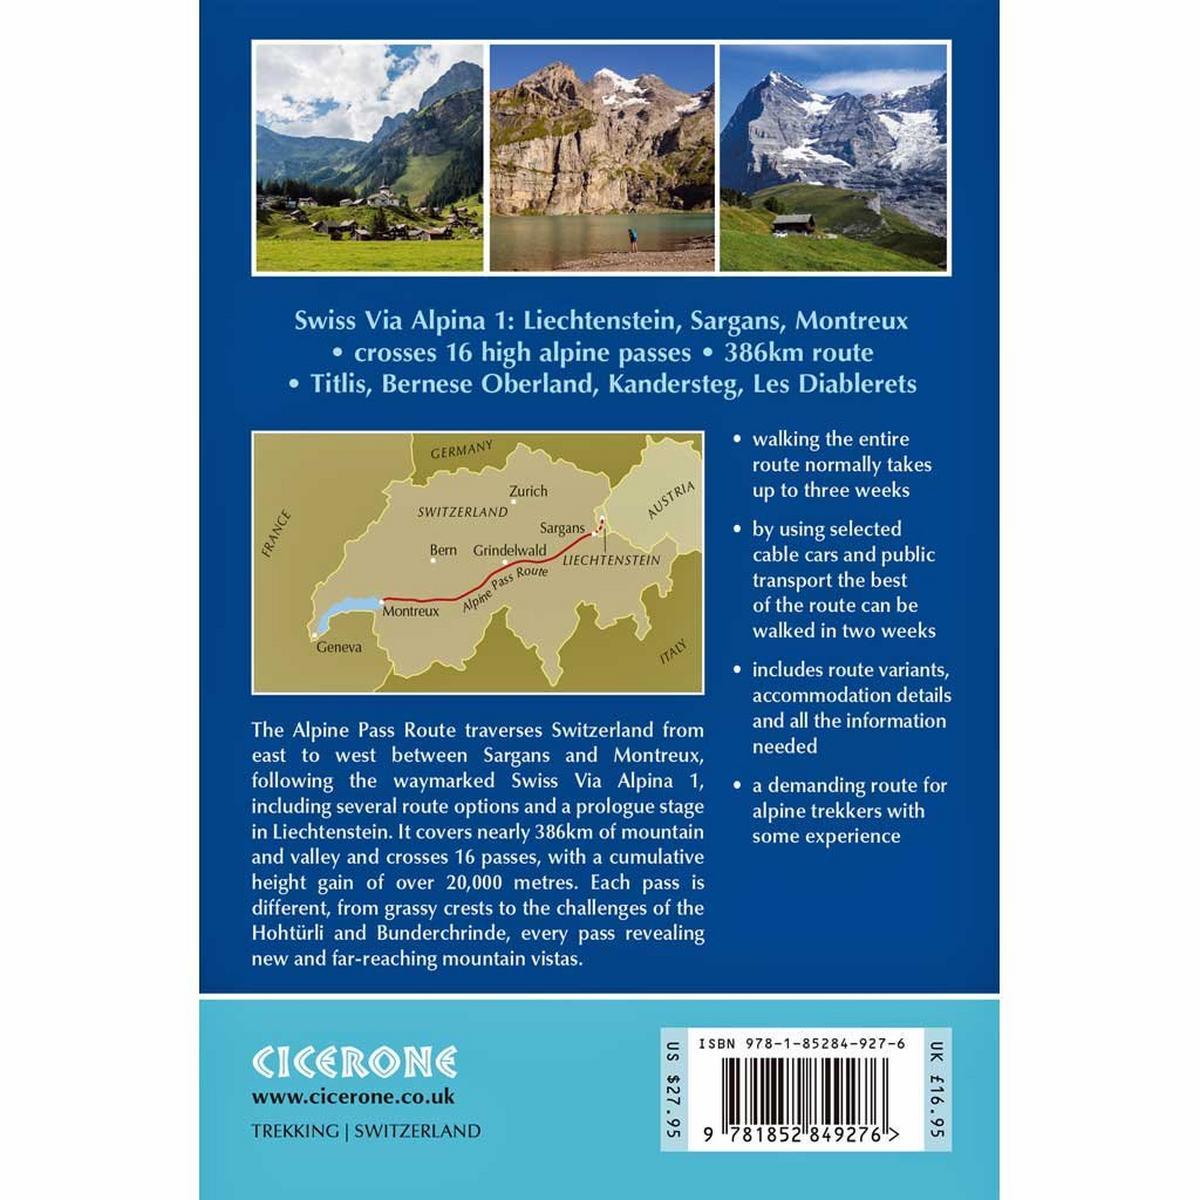 Cicerone Guide Book: Trekking the Swiss Alpine Pass Route - Via Alpina 1